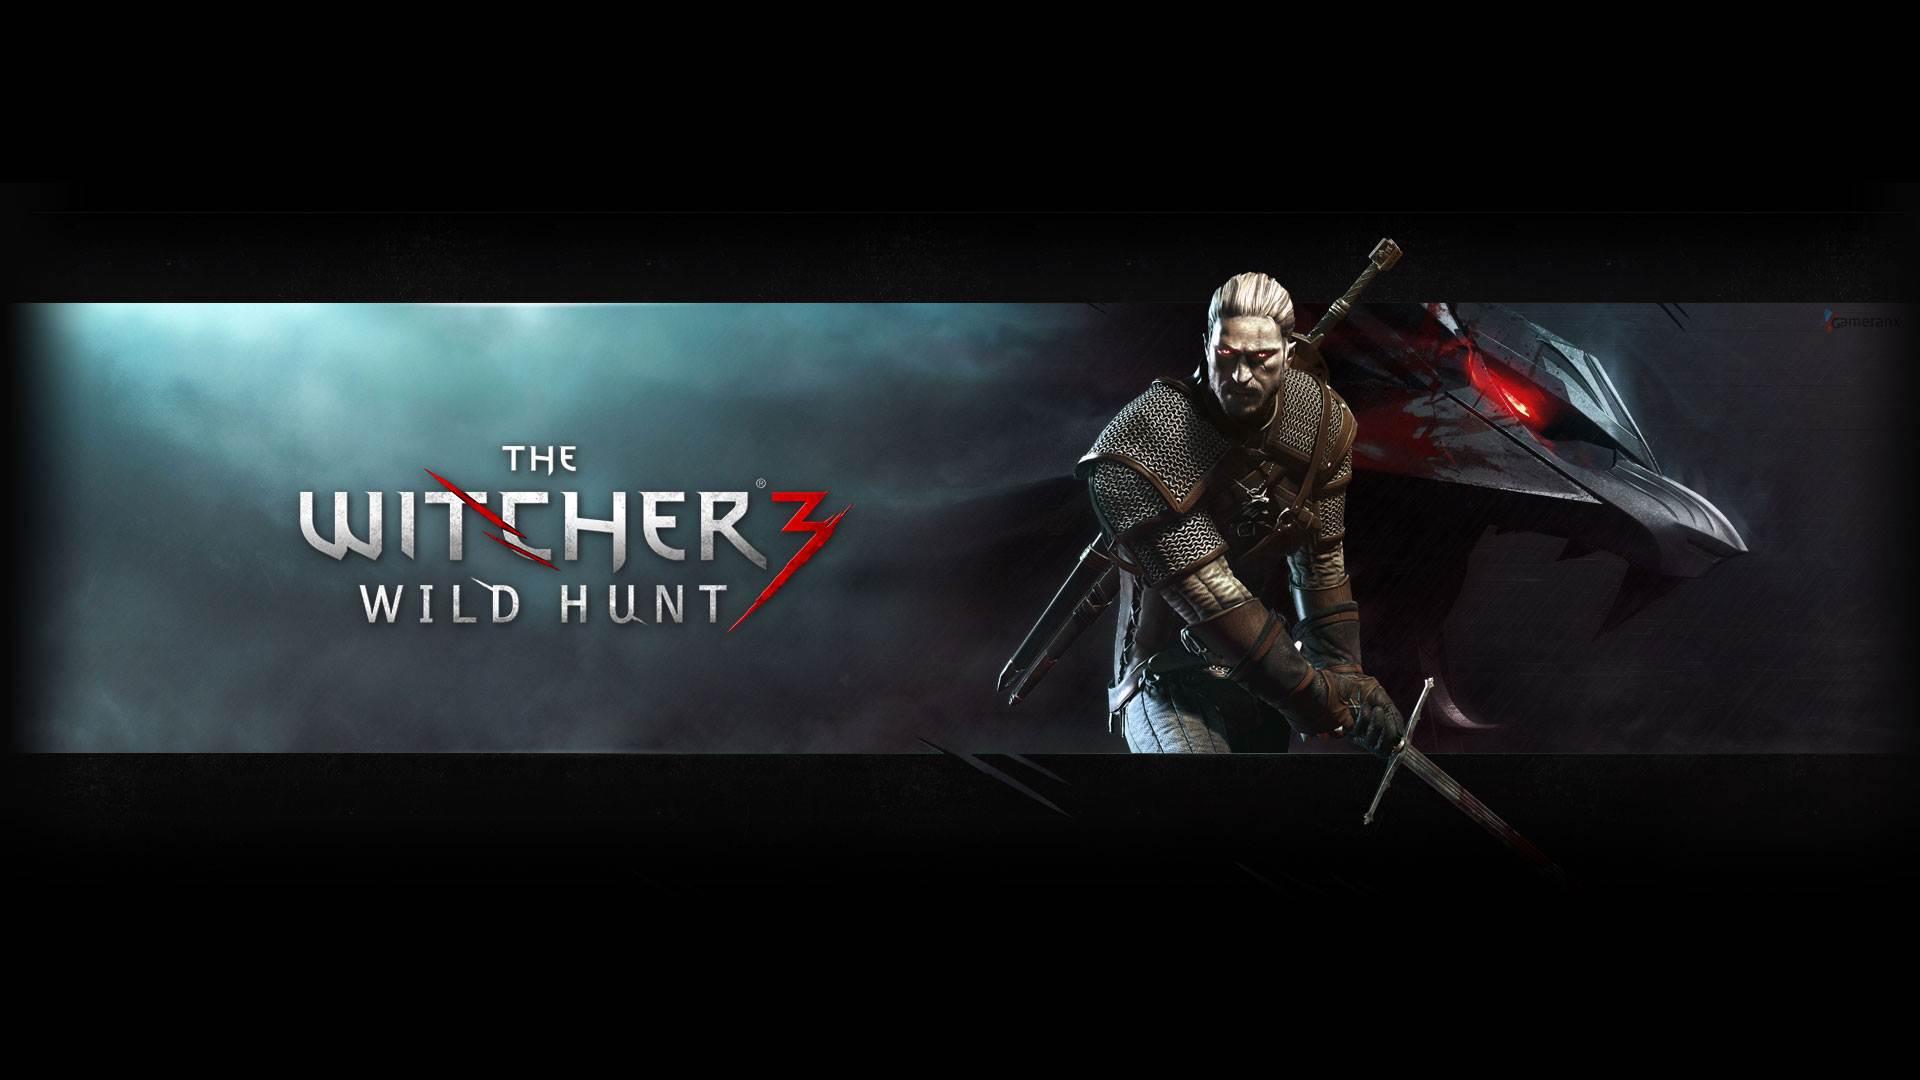 Witcher 3 Hd Wallpaper